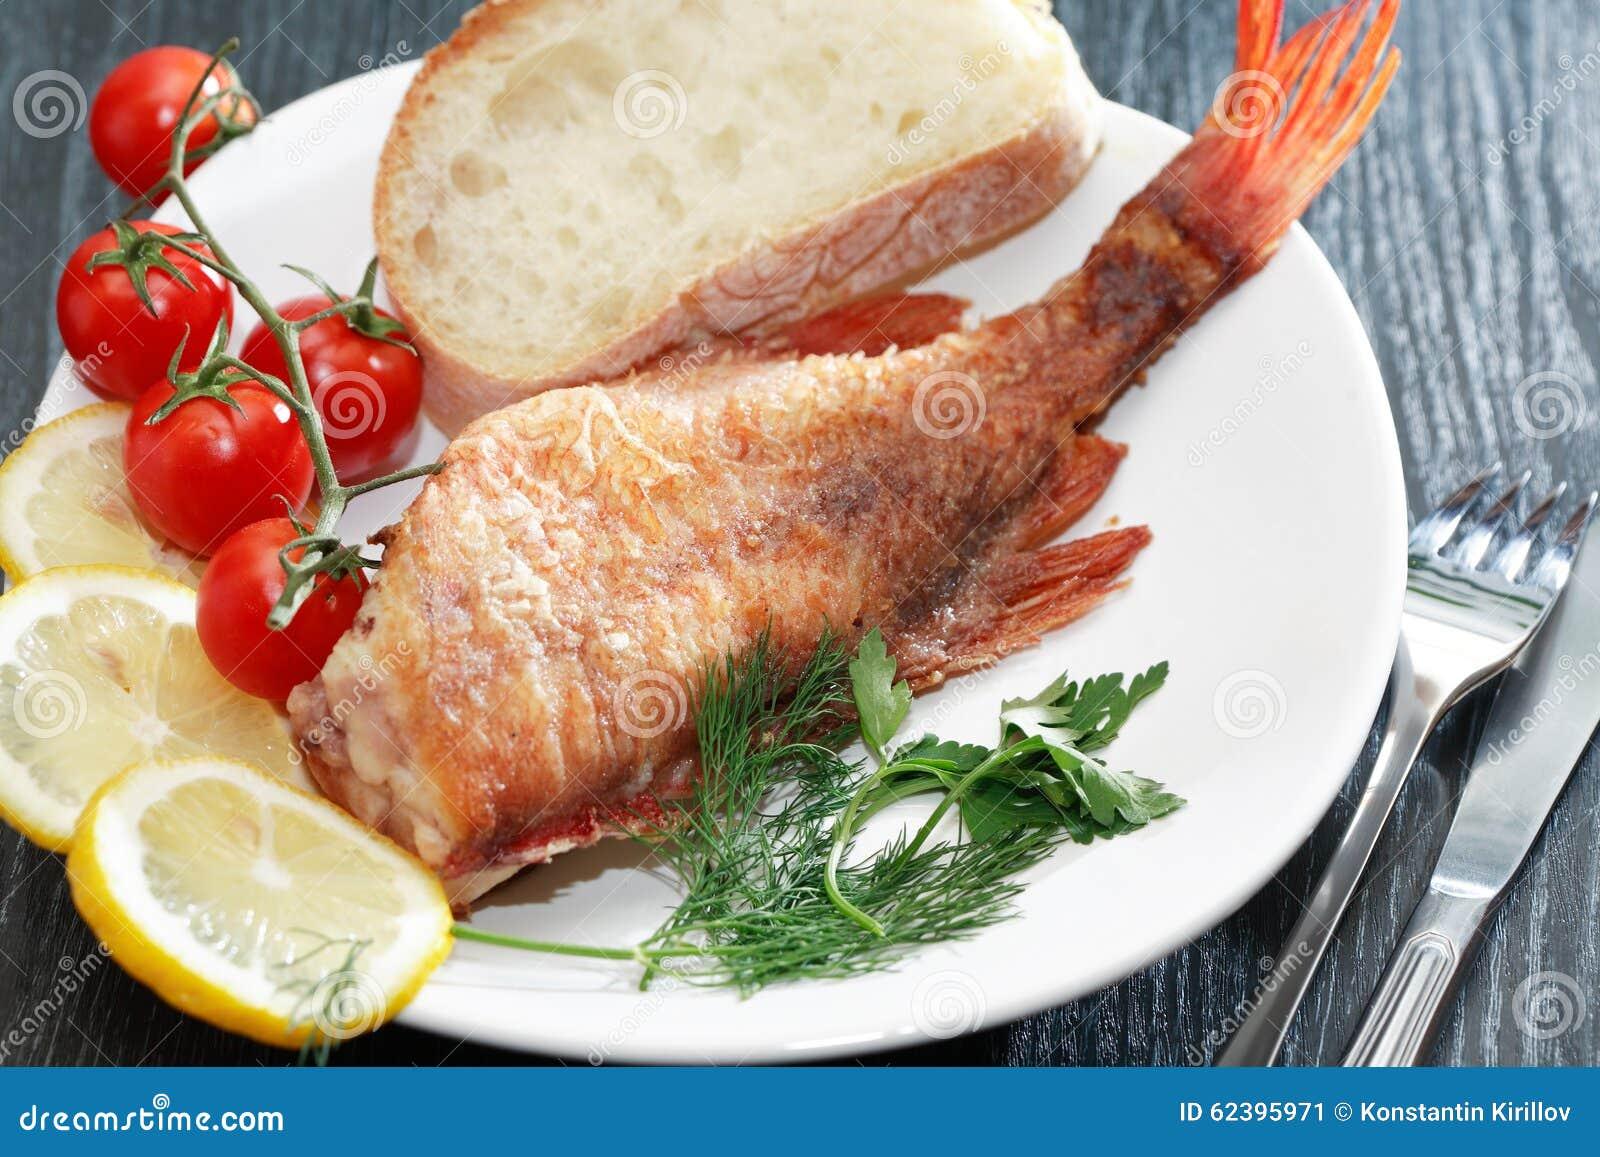 how to make sea bass fish